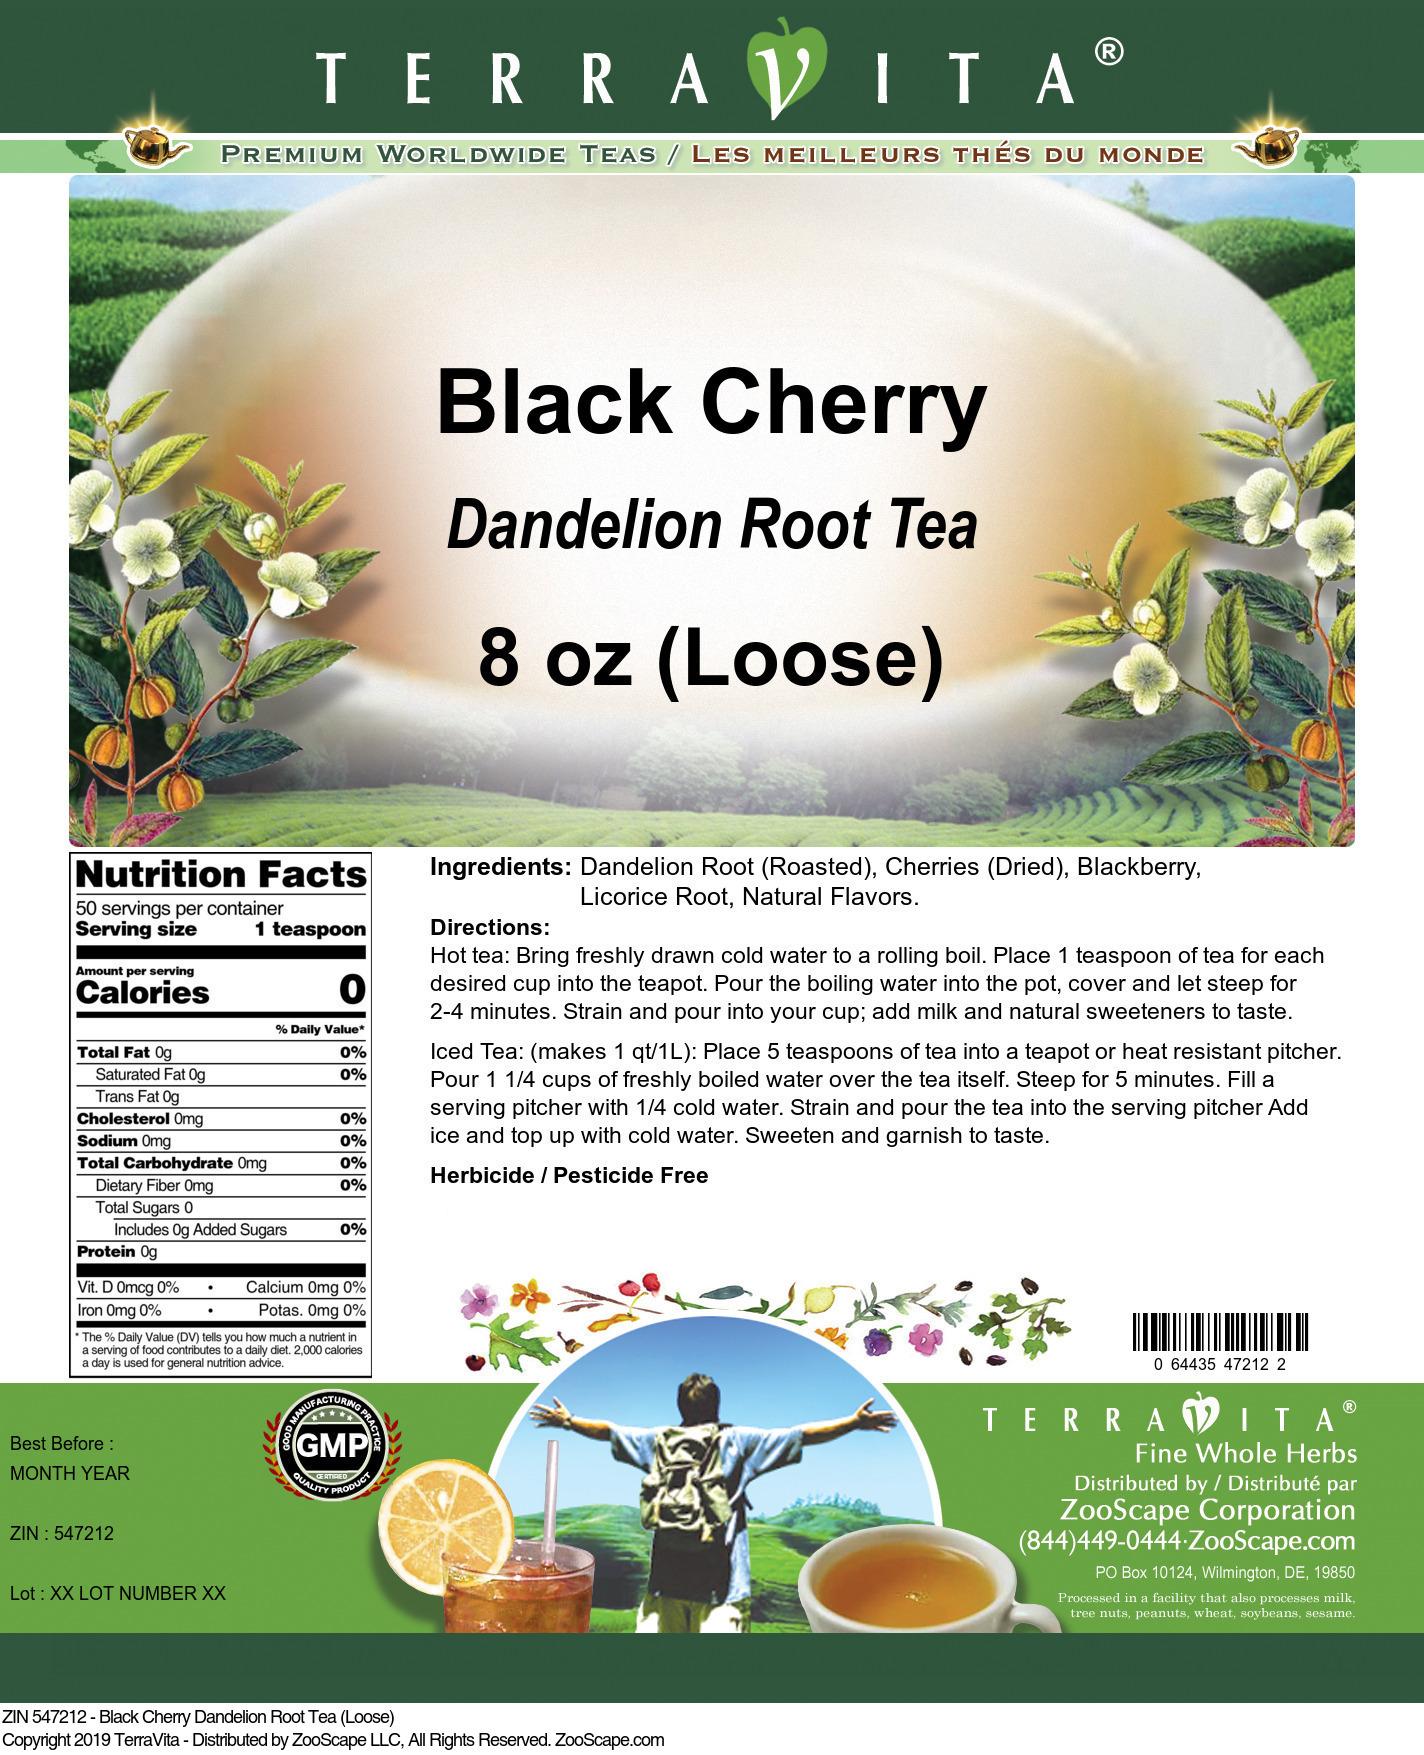 Black Cherry Dandelion Root